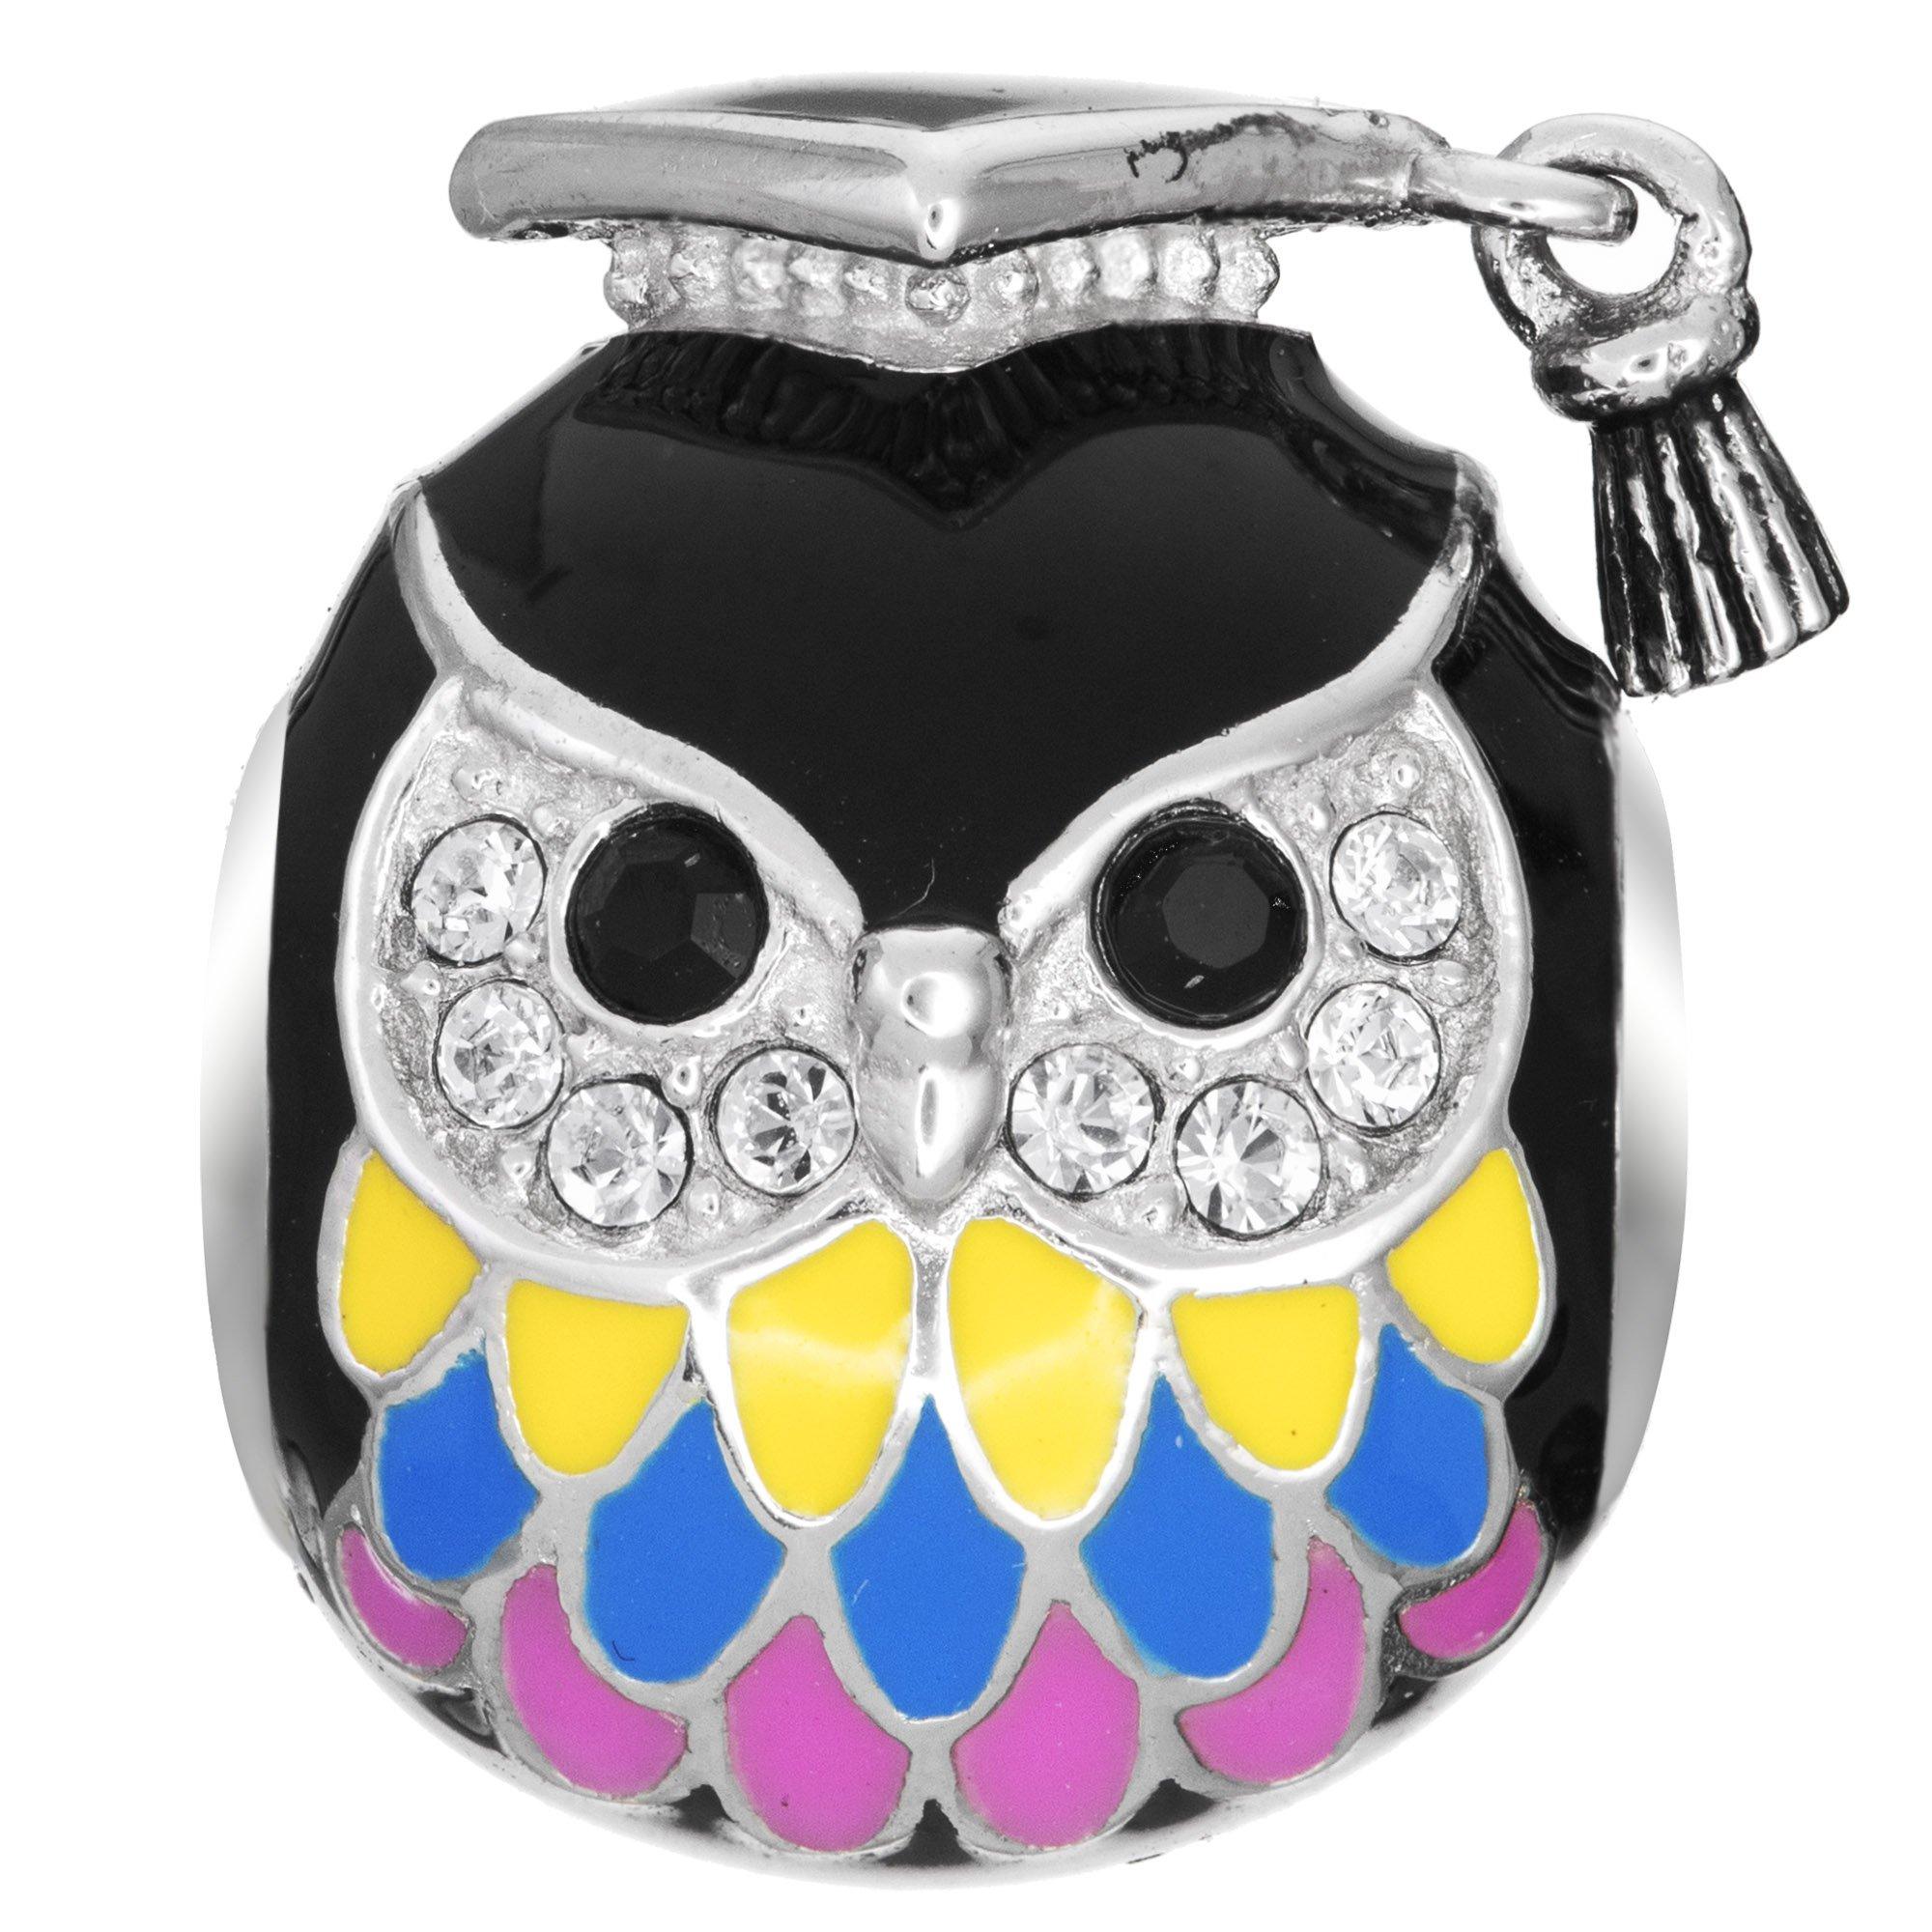 Qina C Rhodium On 925 Sterling Silver Owl Graduation Cap Teacher European Style Bead Charm Made with Swarovski Crystals